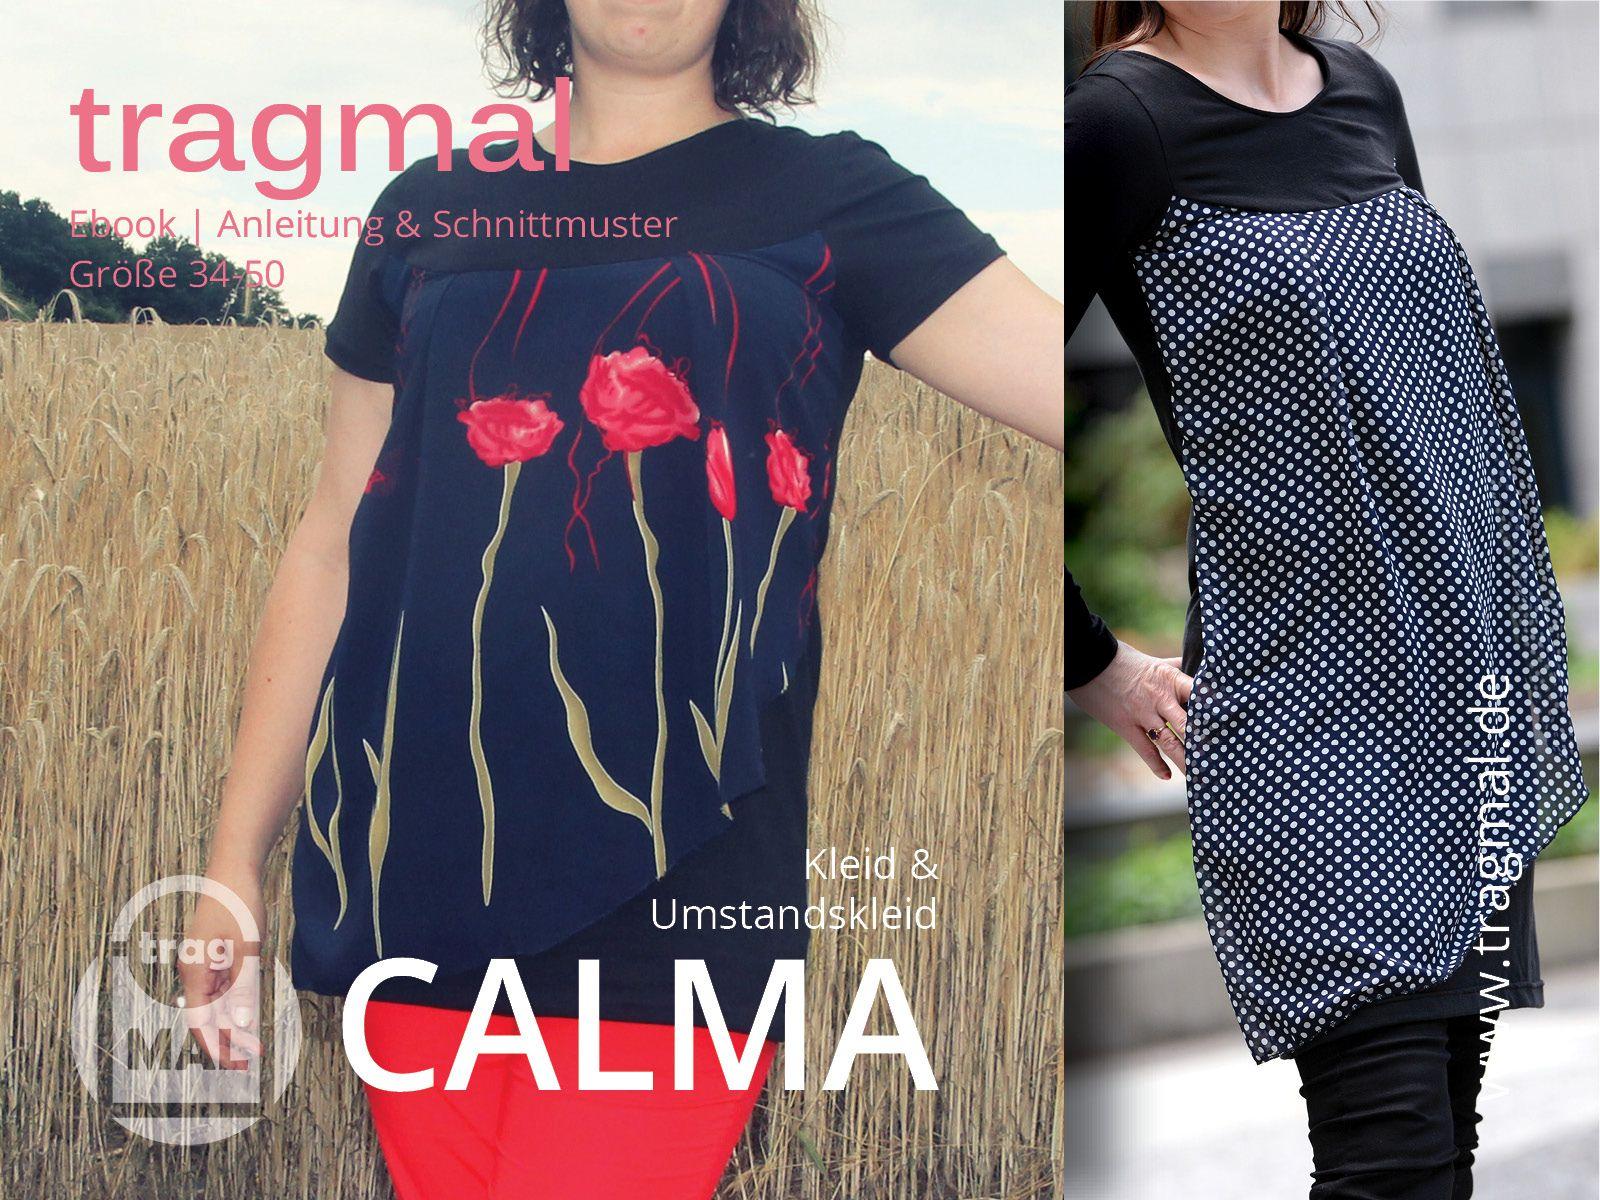 Schnittmuster - Ebook CALMA (Umstandskleid / Shirt) - Gr. 34-50 ...